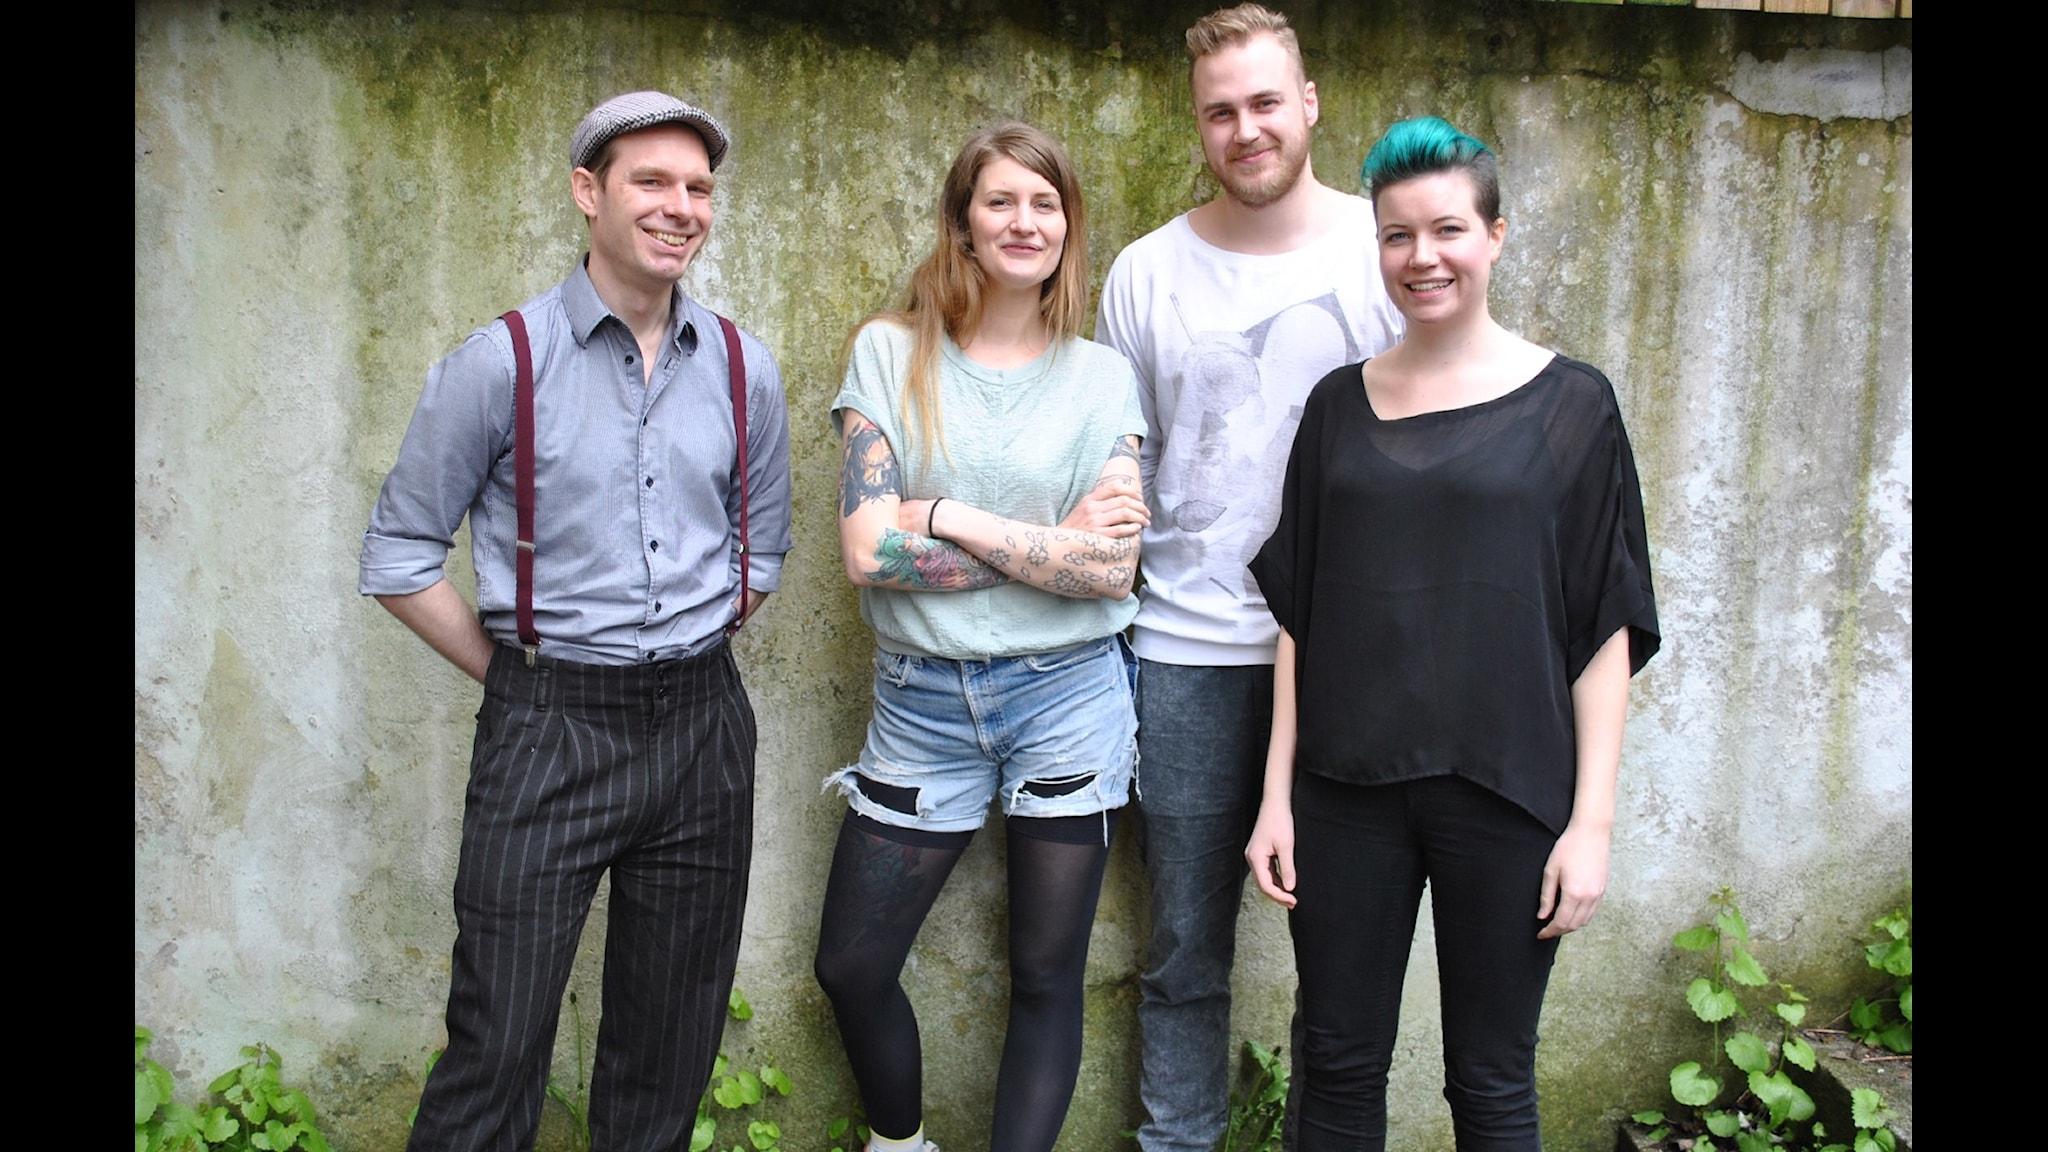 Jon Back, Susanne Möller, Tobias Norström & Angelica Norgren